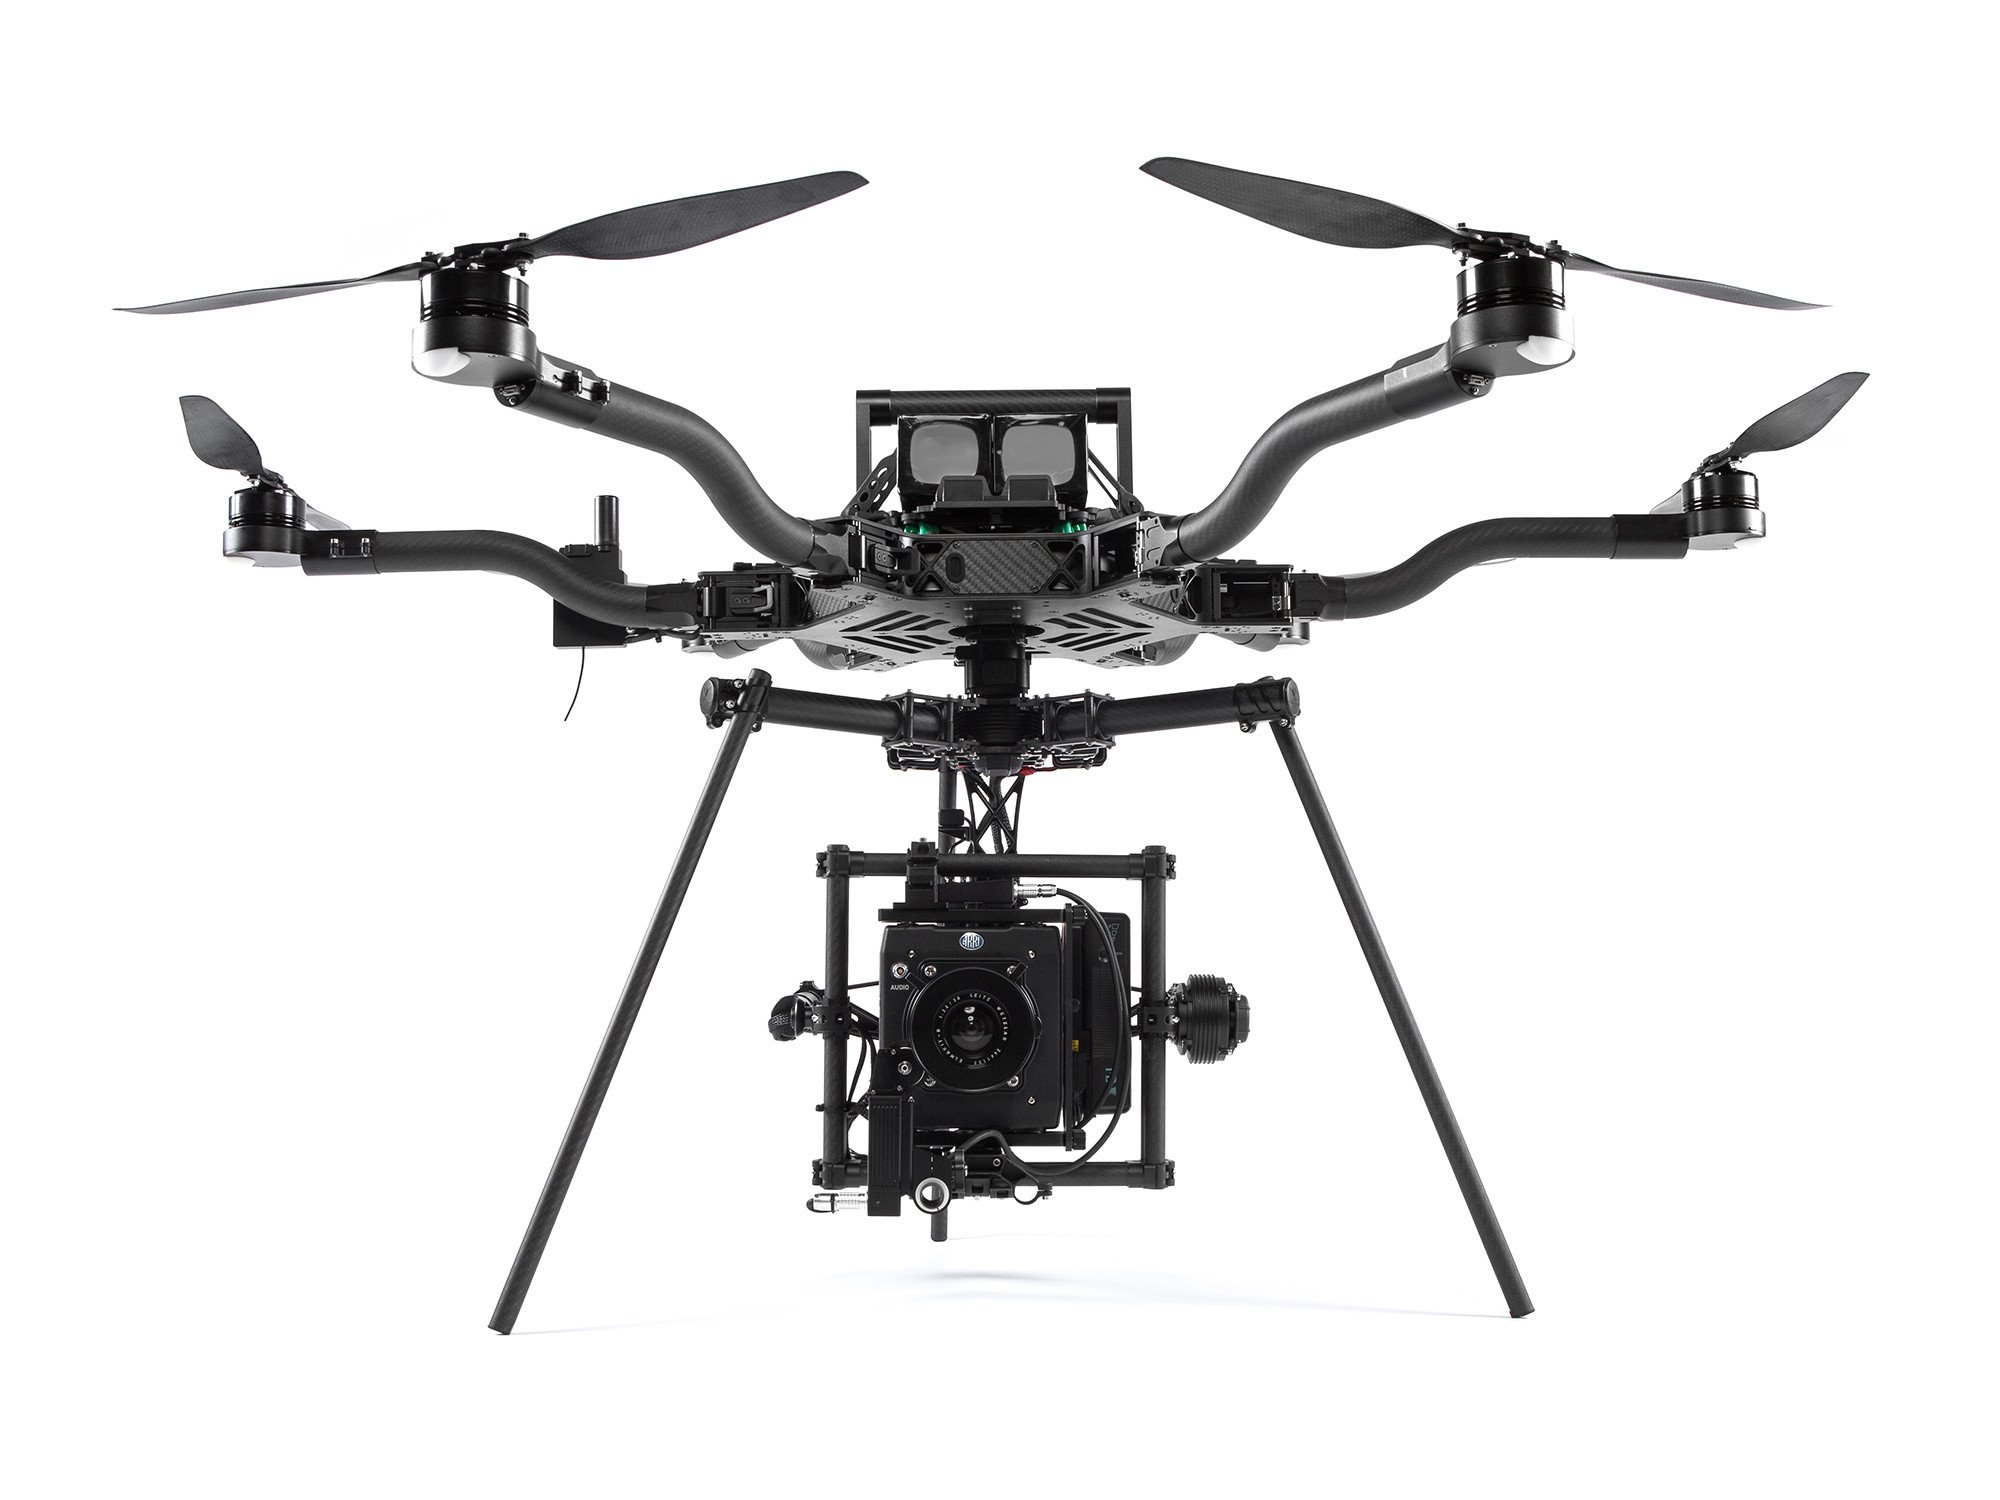 Top Gas Powered Drones 3 Best Gasoline Drones For Sale